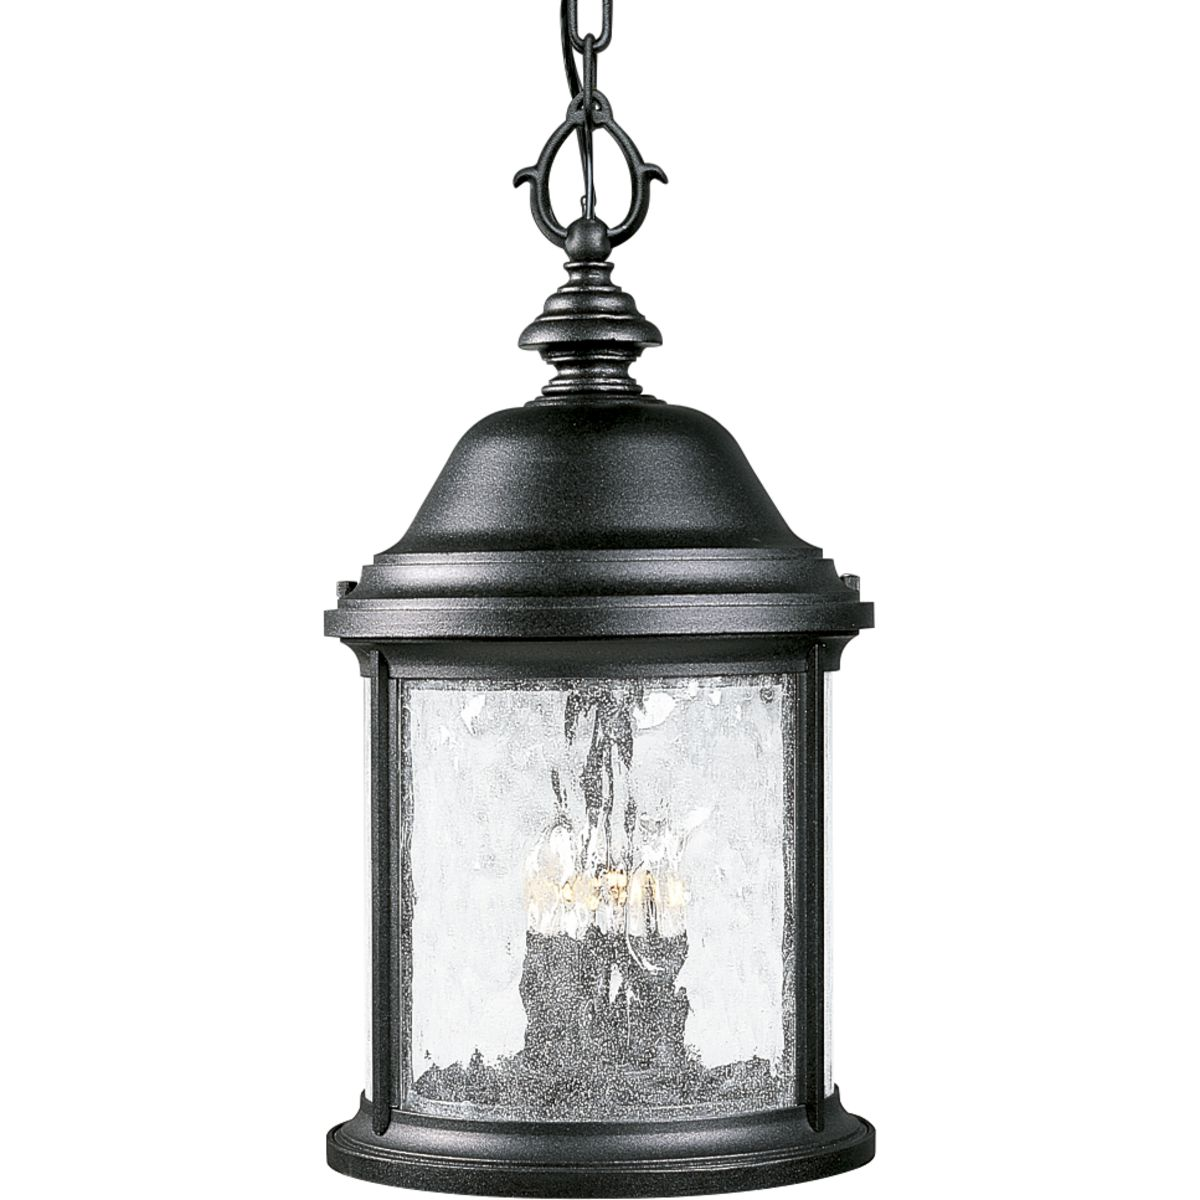 PRO P5550-31 3X60C Textured Black Water Seeded Glass Hanging Lantern